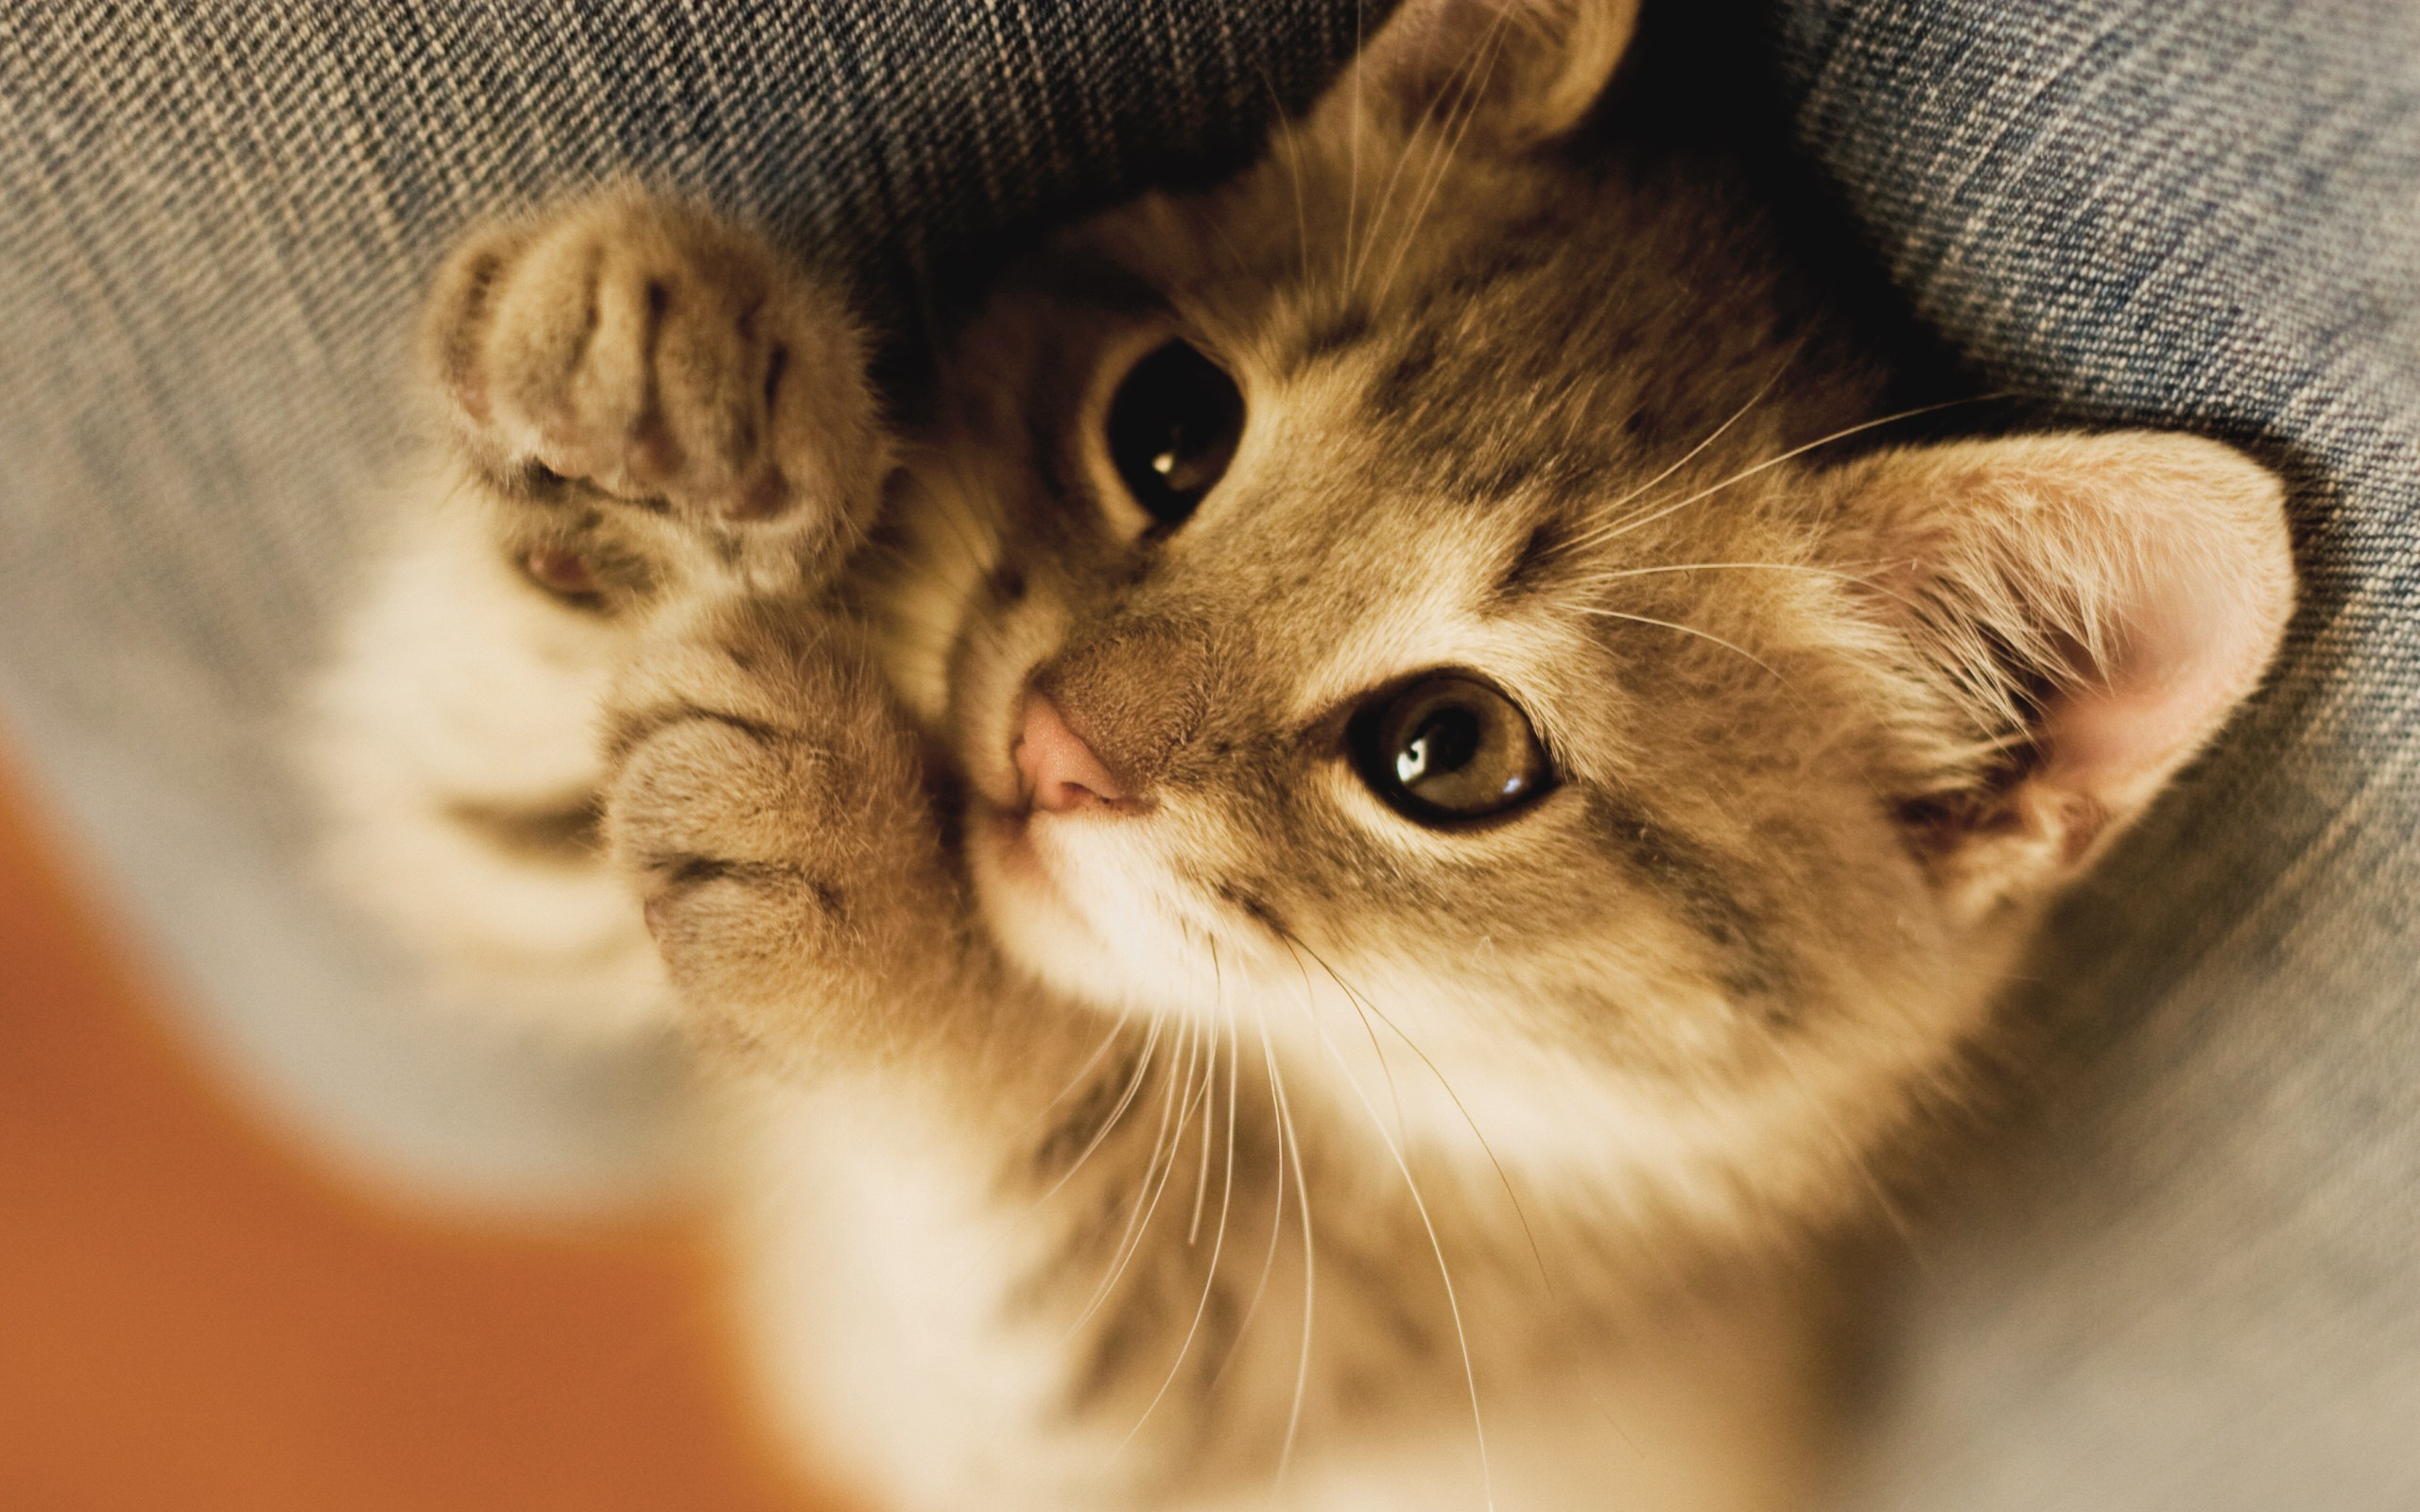 Baby Kitten Wallpaper 1